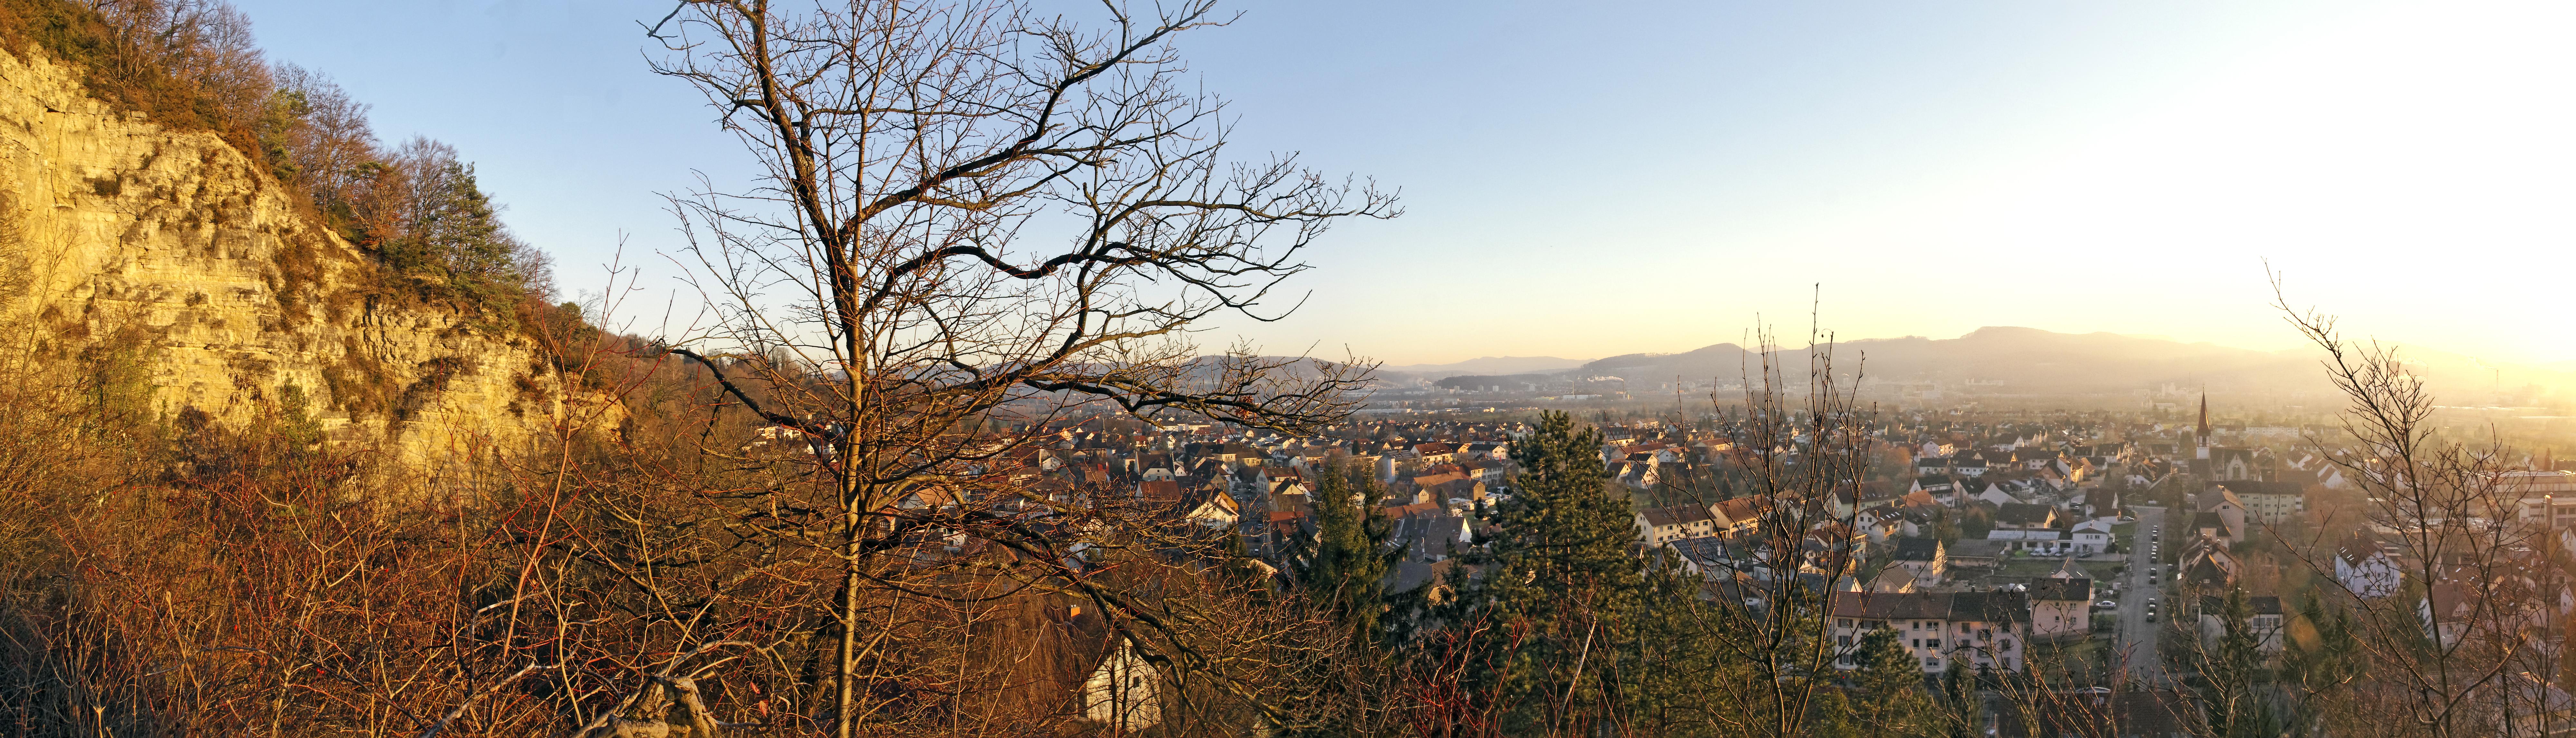 Wyhlen seen from Neuweg